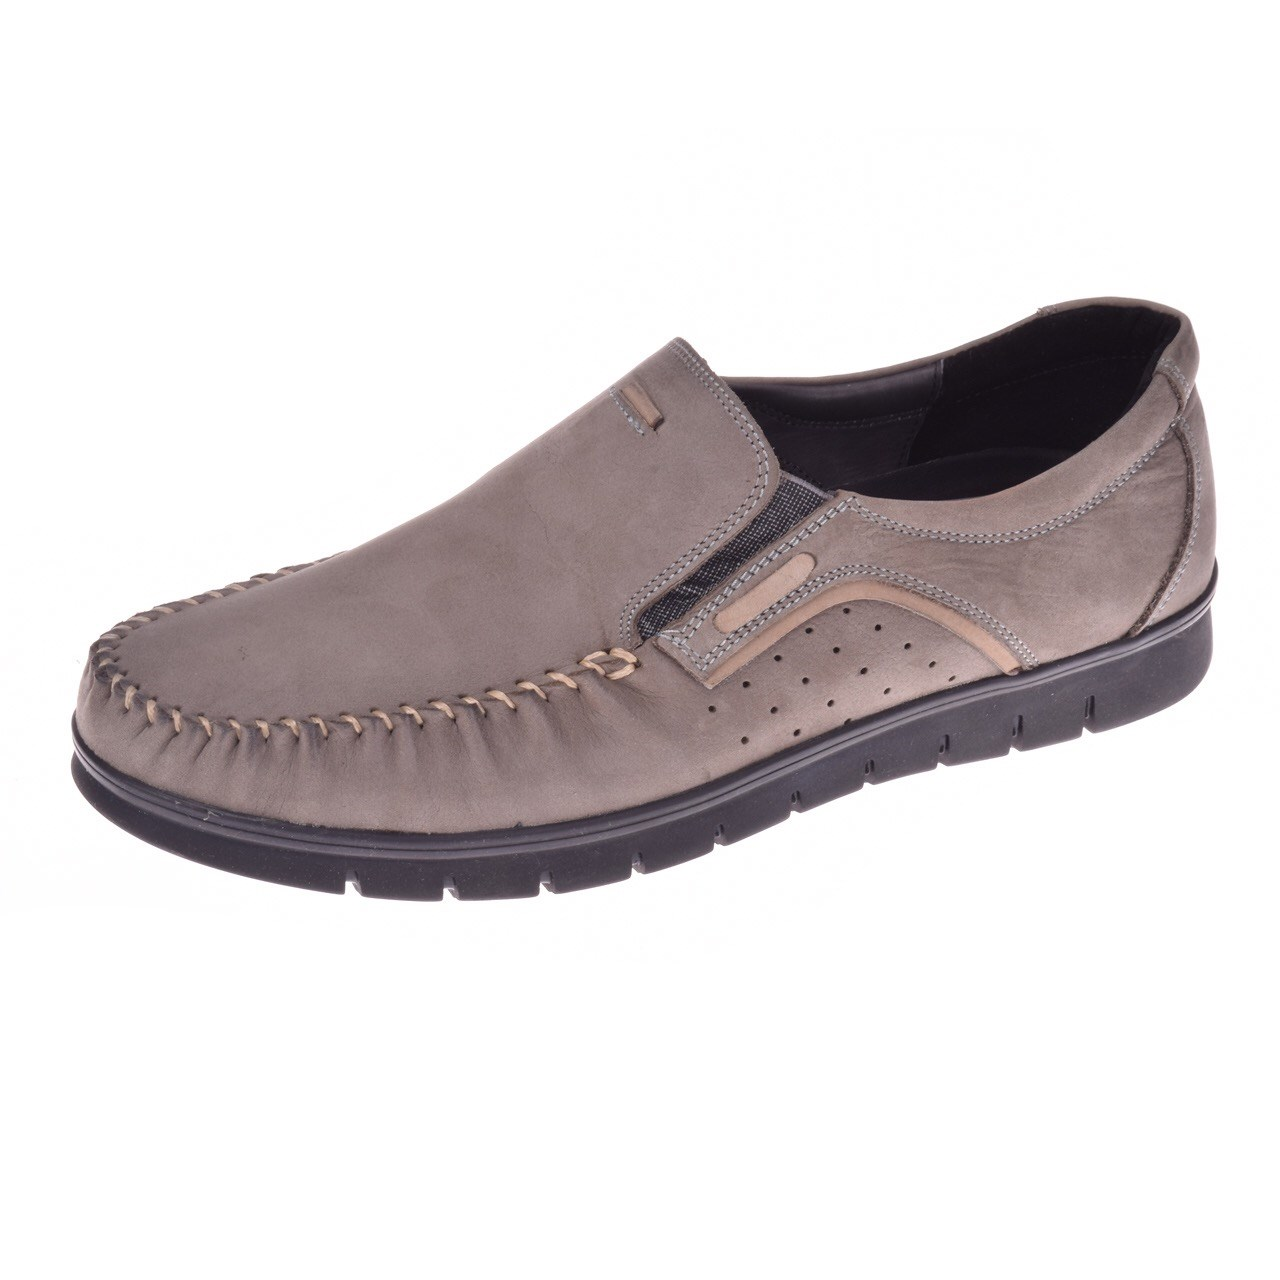 کفش مردانه پانیسا مدل Rebol-Grey